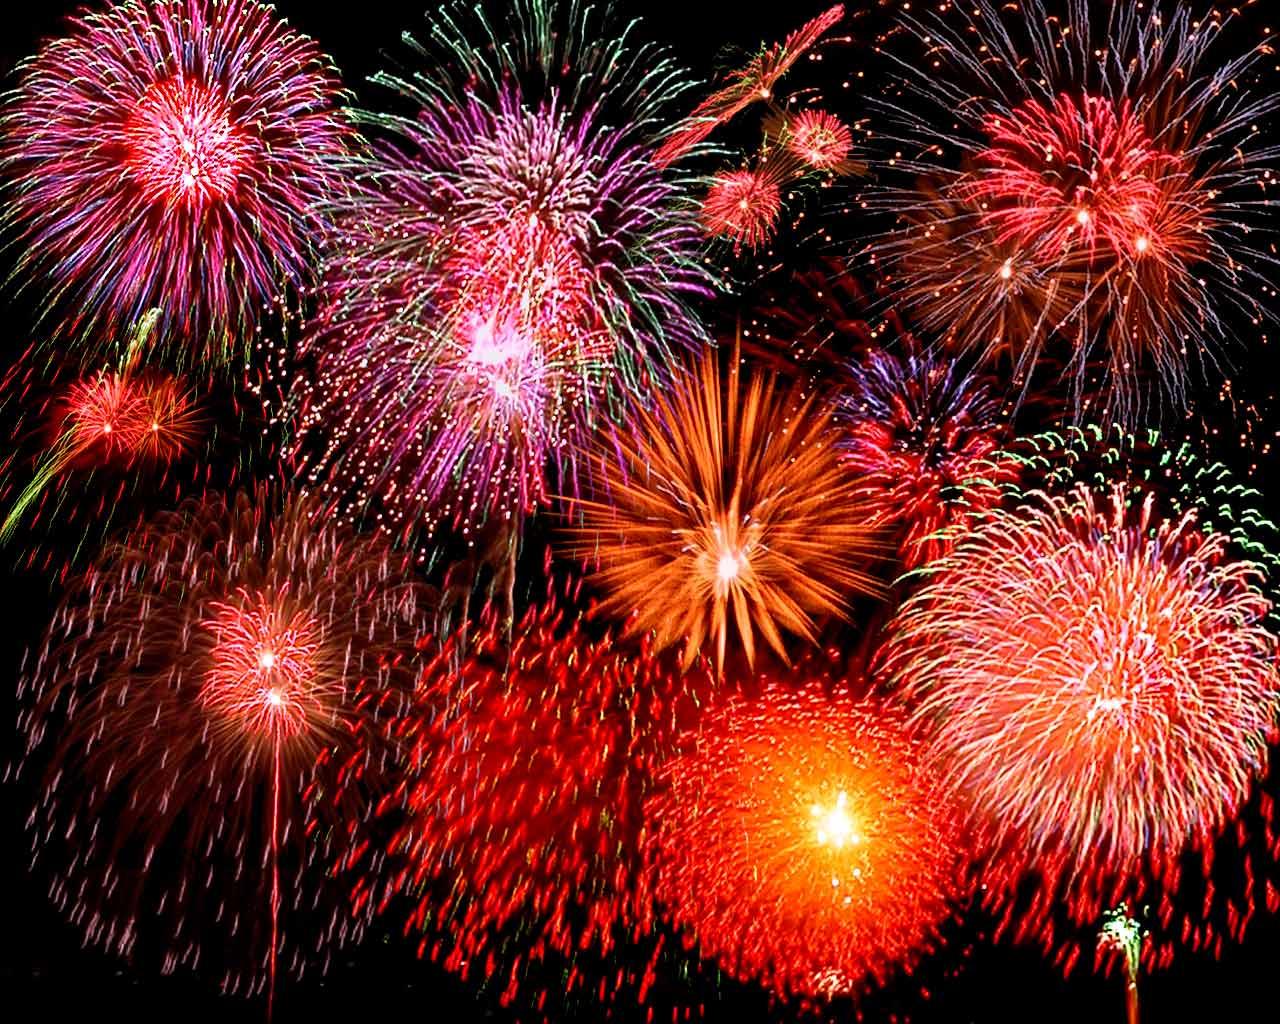 http://1.bp.blogspot.com/_rLieEpXVD94/TMfDUJBHApI/AAAAAAAAAHo/nWcUP5UqKLA/s1600/fireworks.jpg